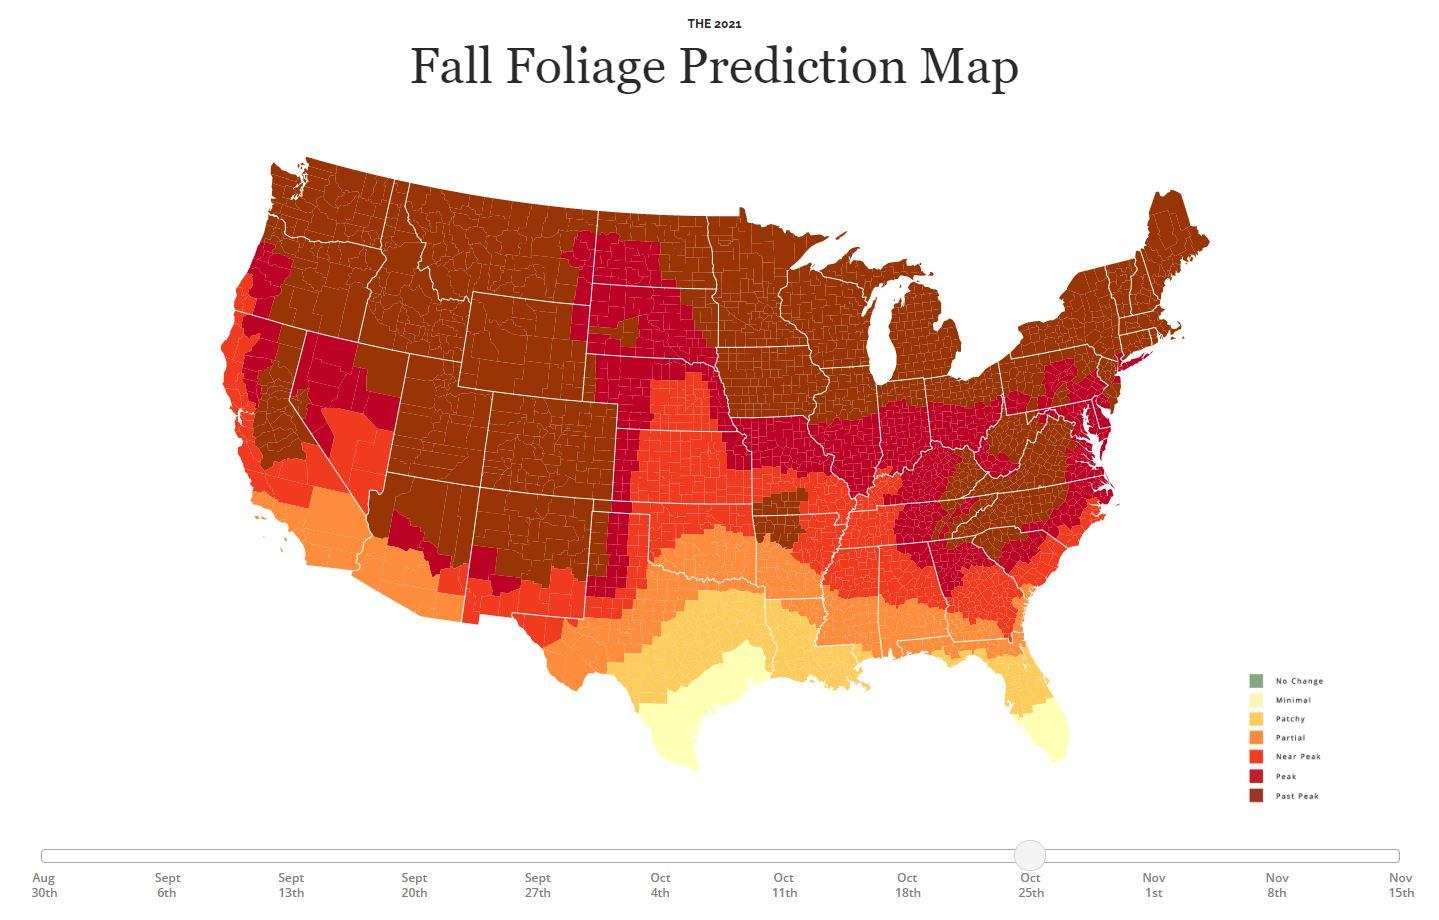 virginia peak fall foliage map 2021